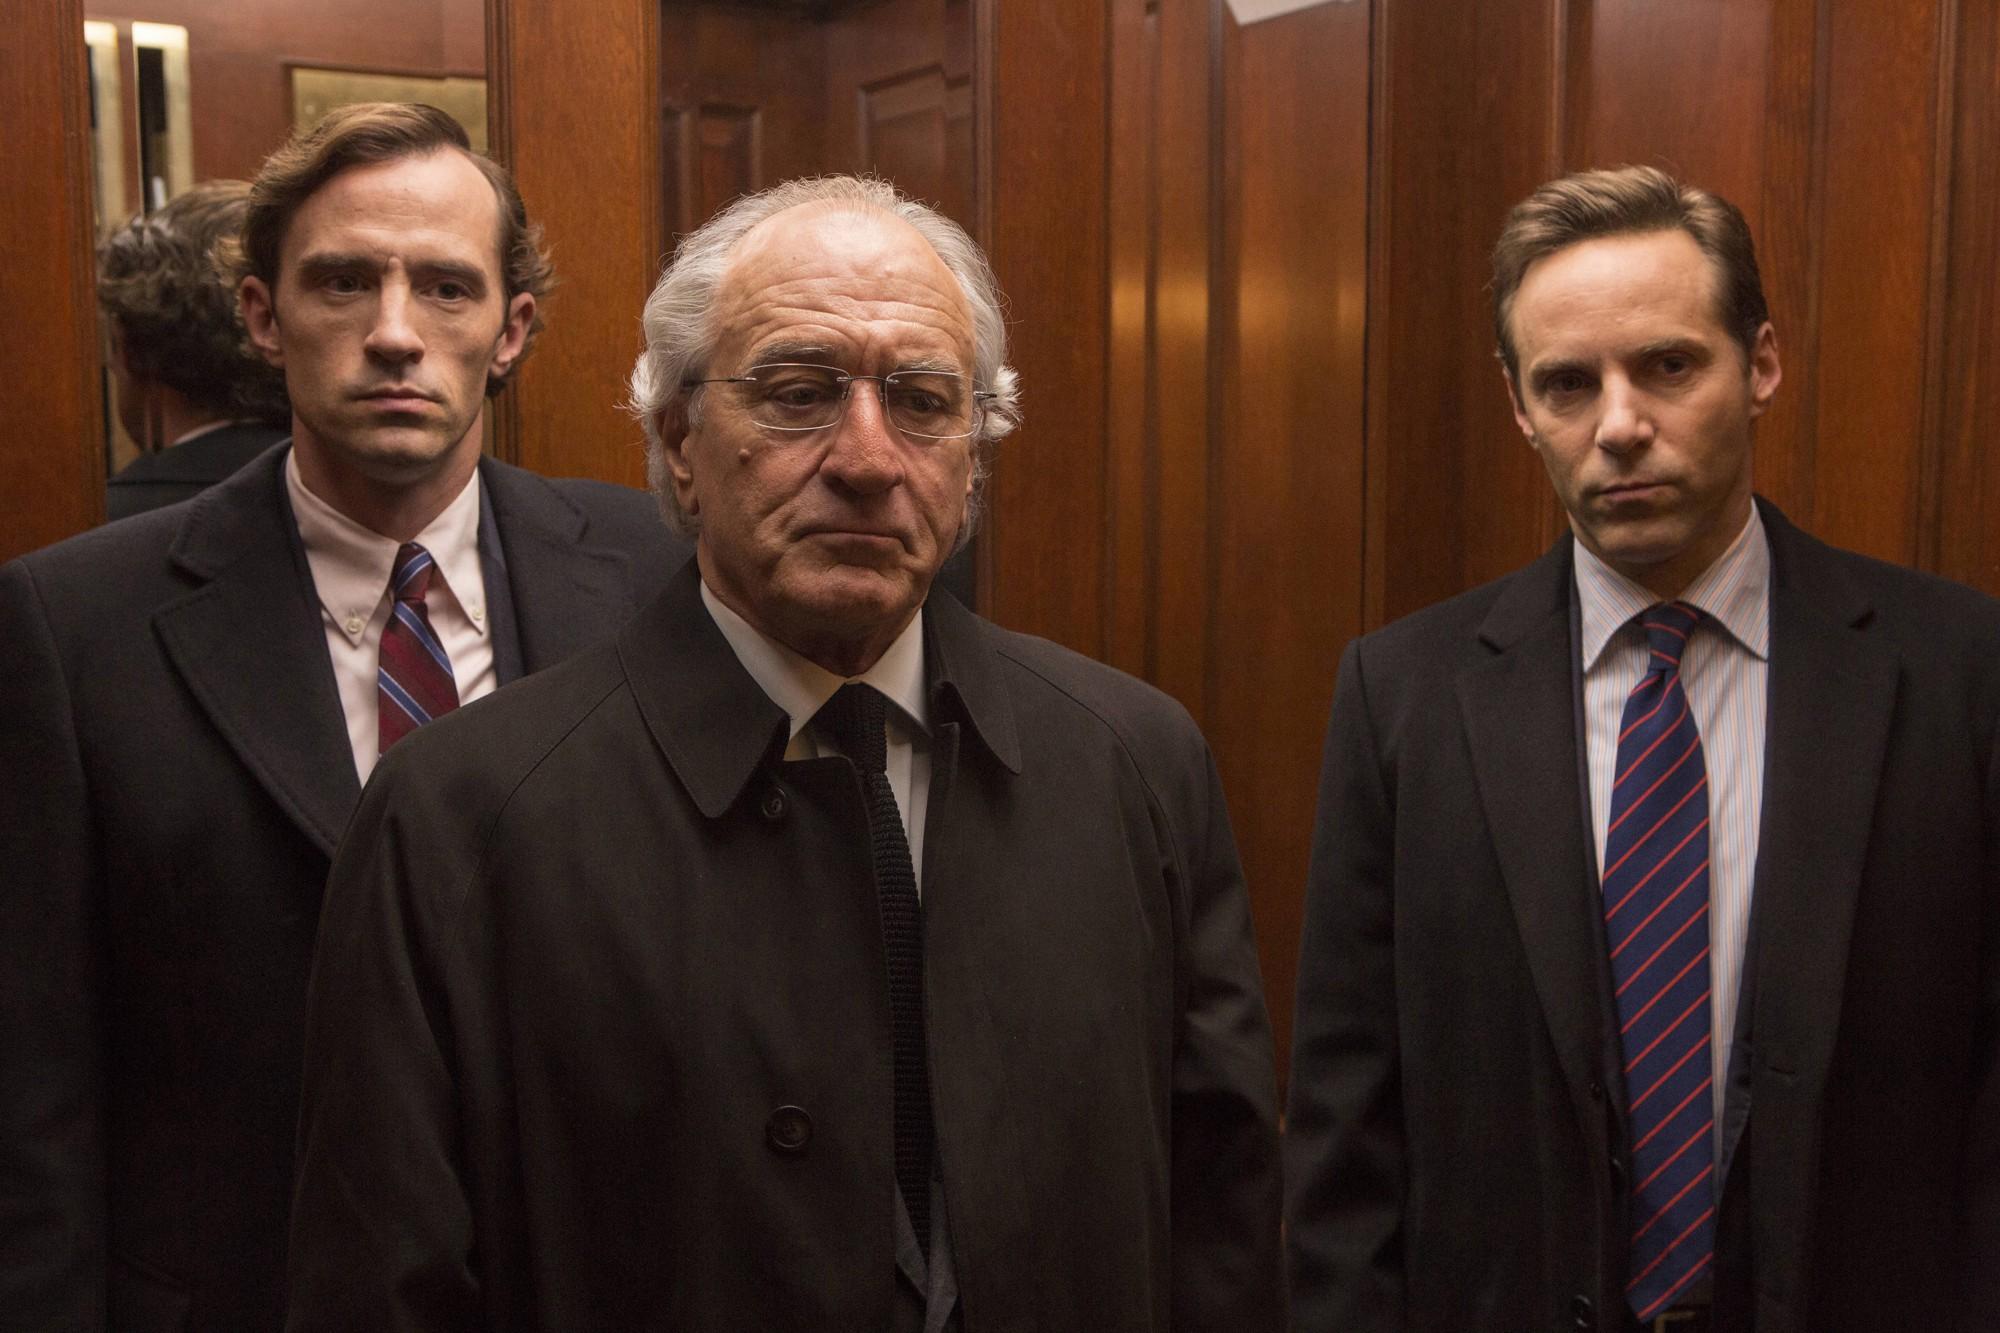 Wizard of Lies Nathan Darrow, Robert De Niro, Alessandro Nivola